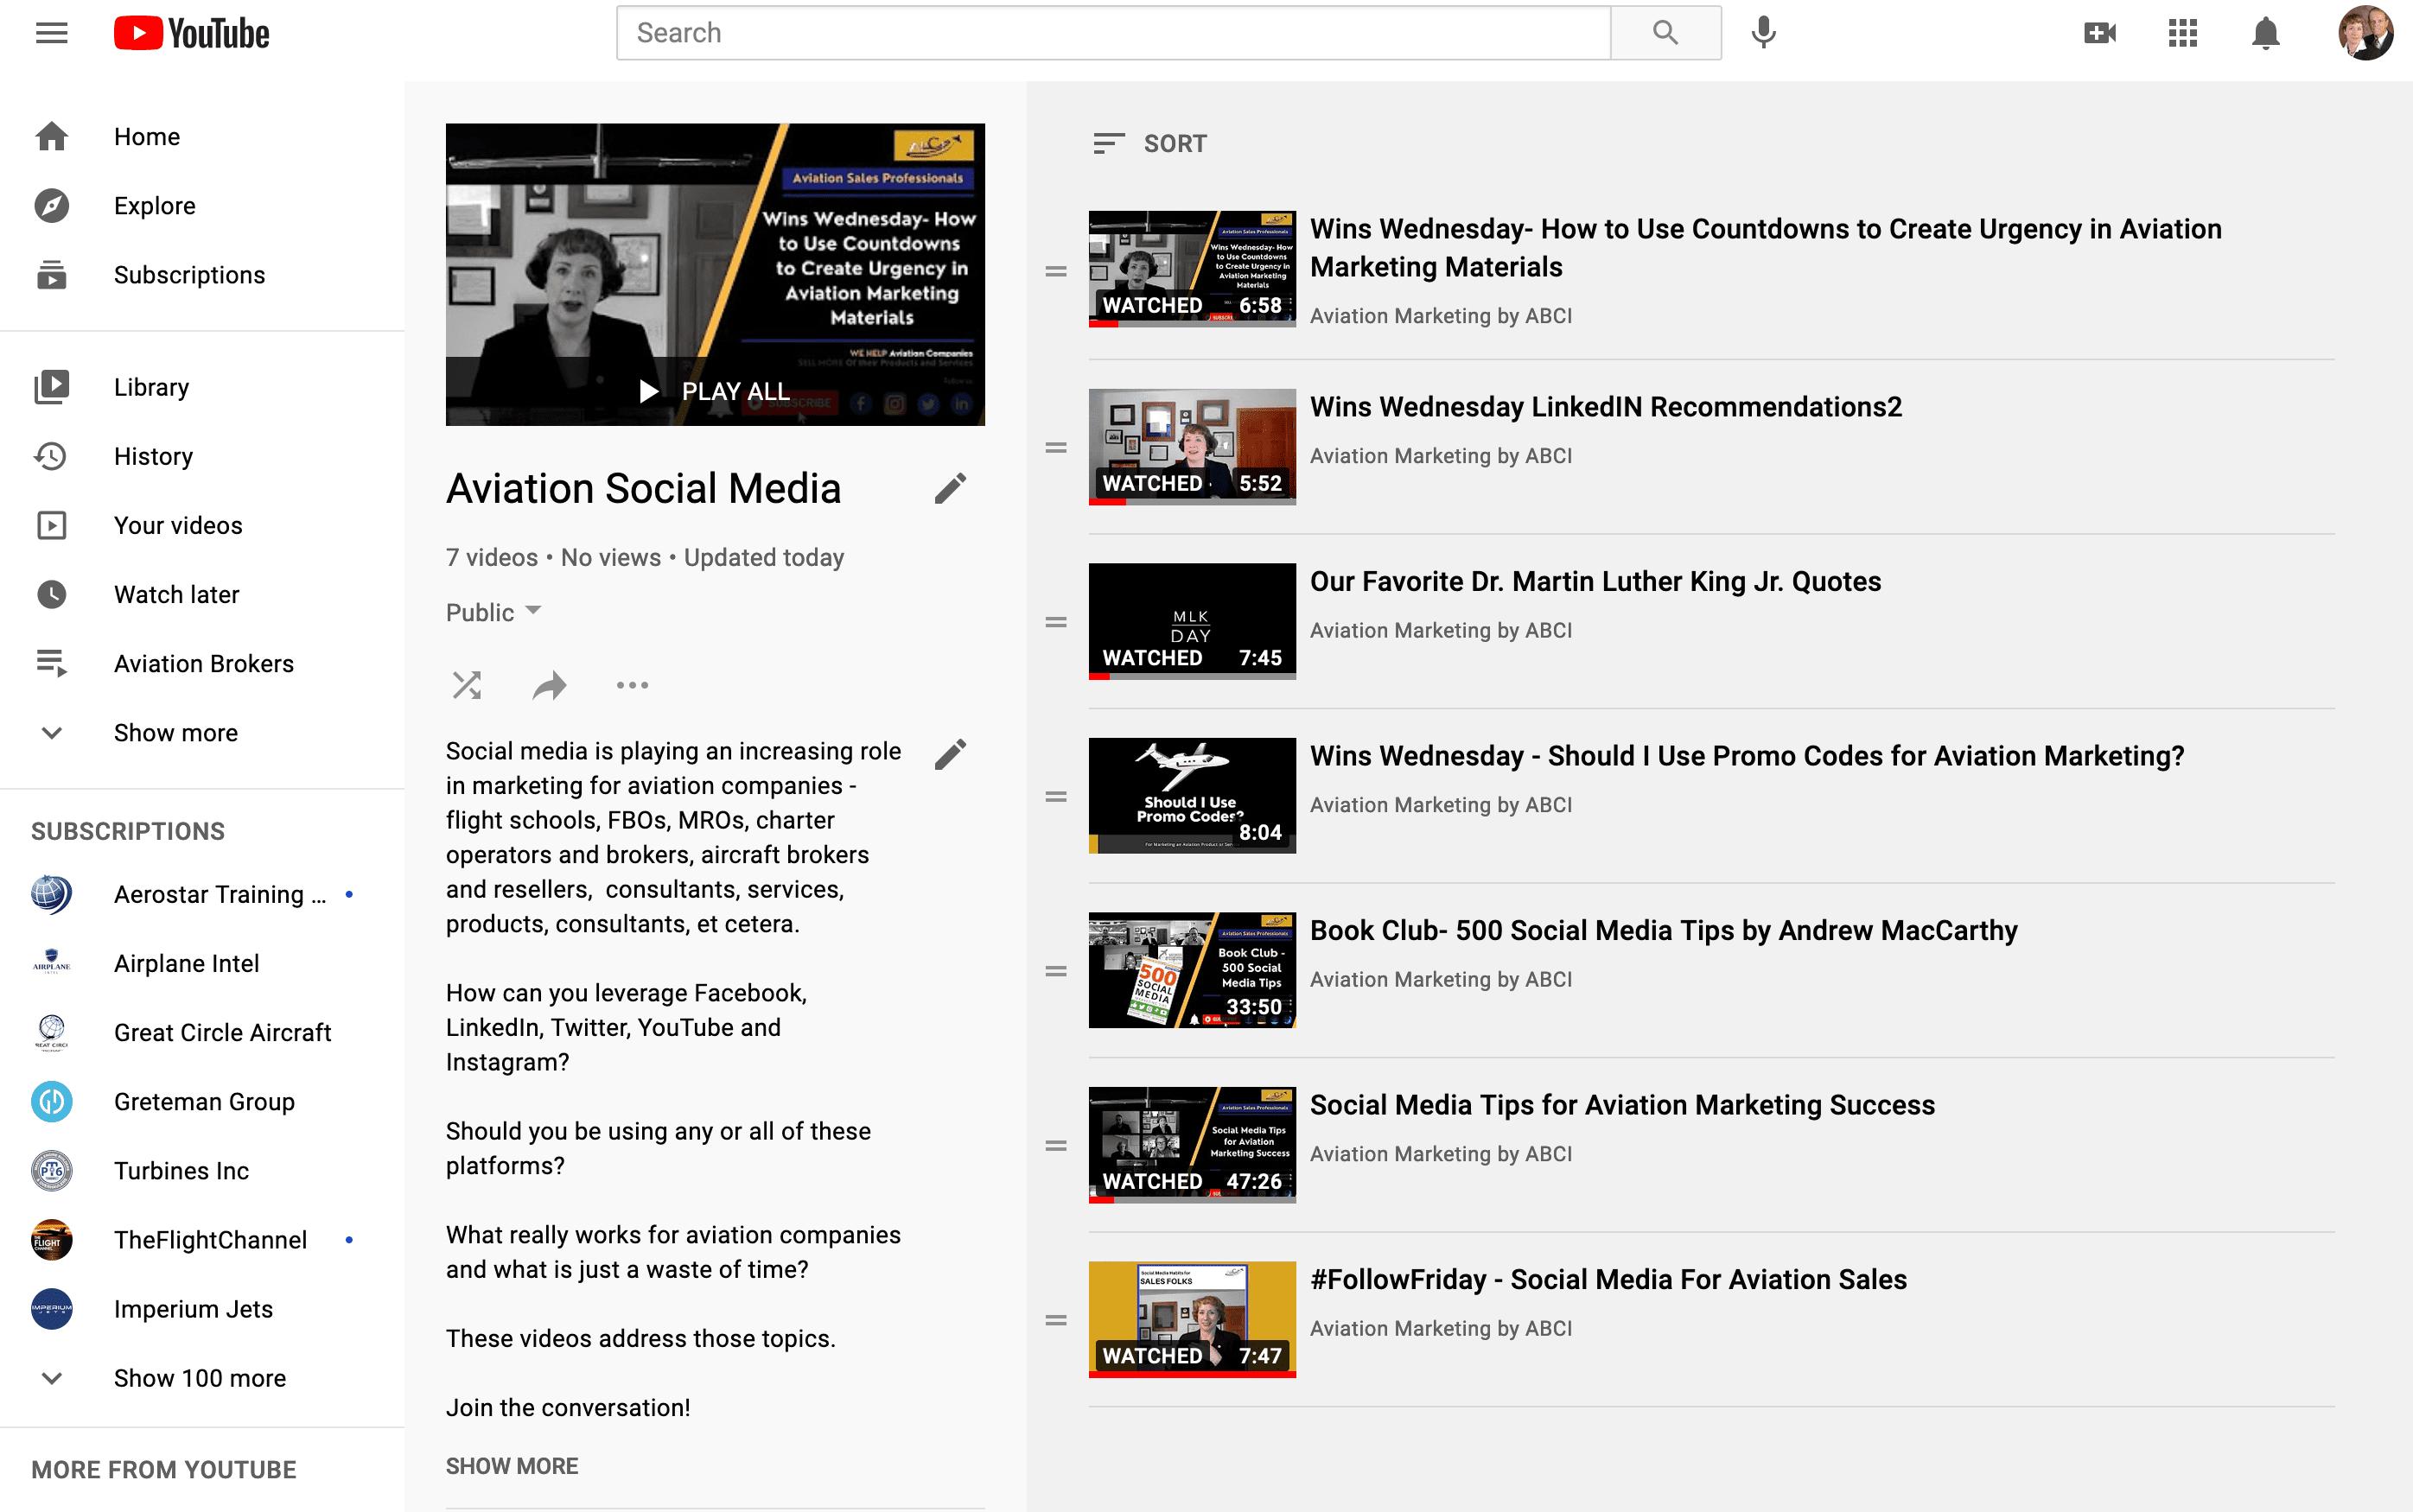 YouTube Playlist - Aviation Social Media